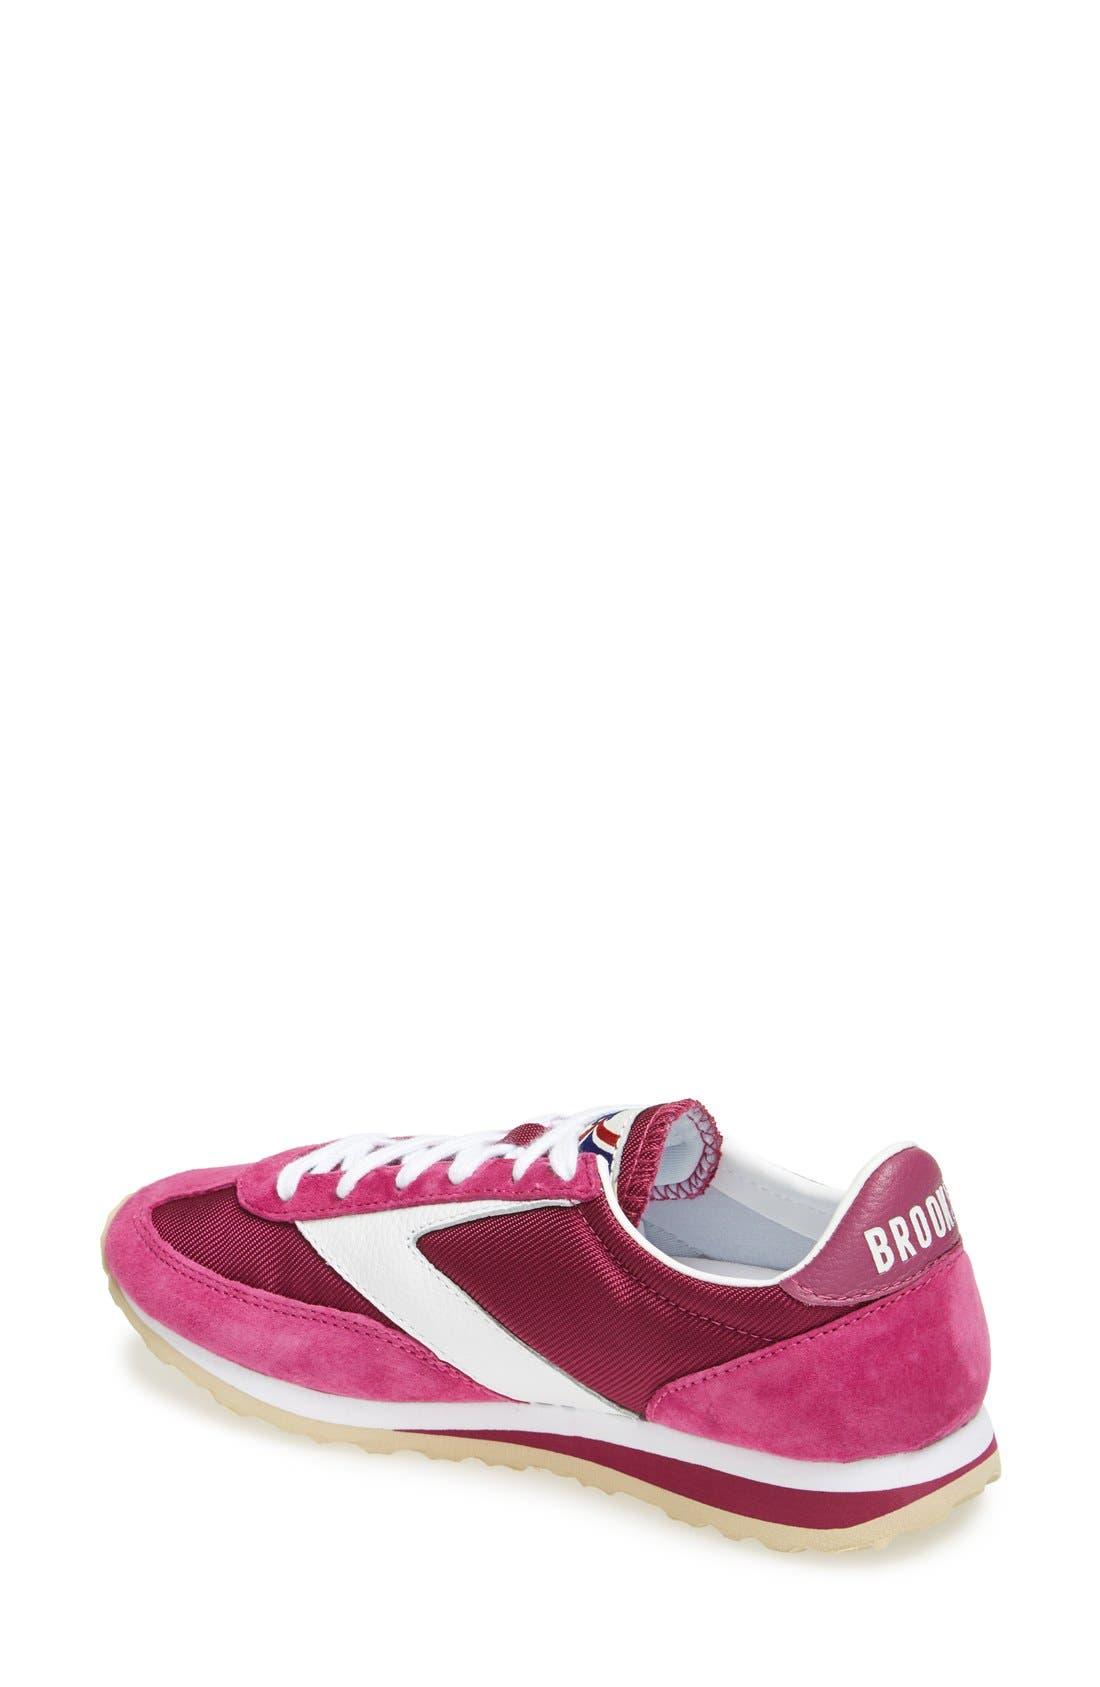 Alternate Image 2  - Brooks 'Vanguard' Sneaker (Women)